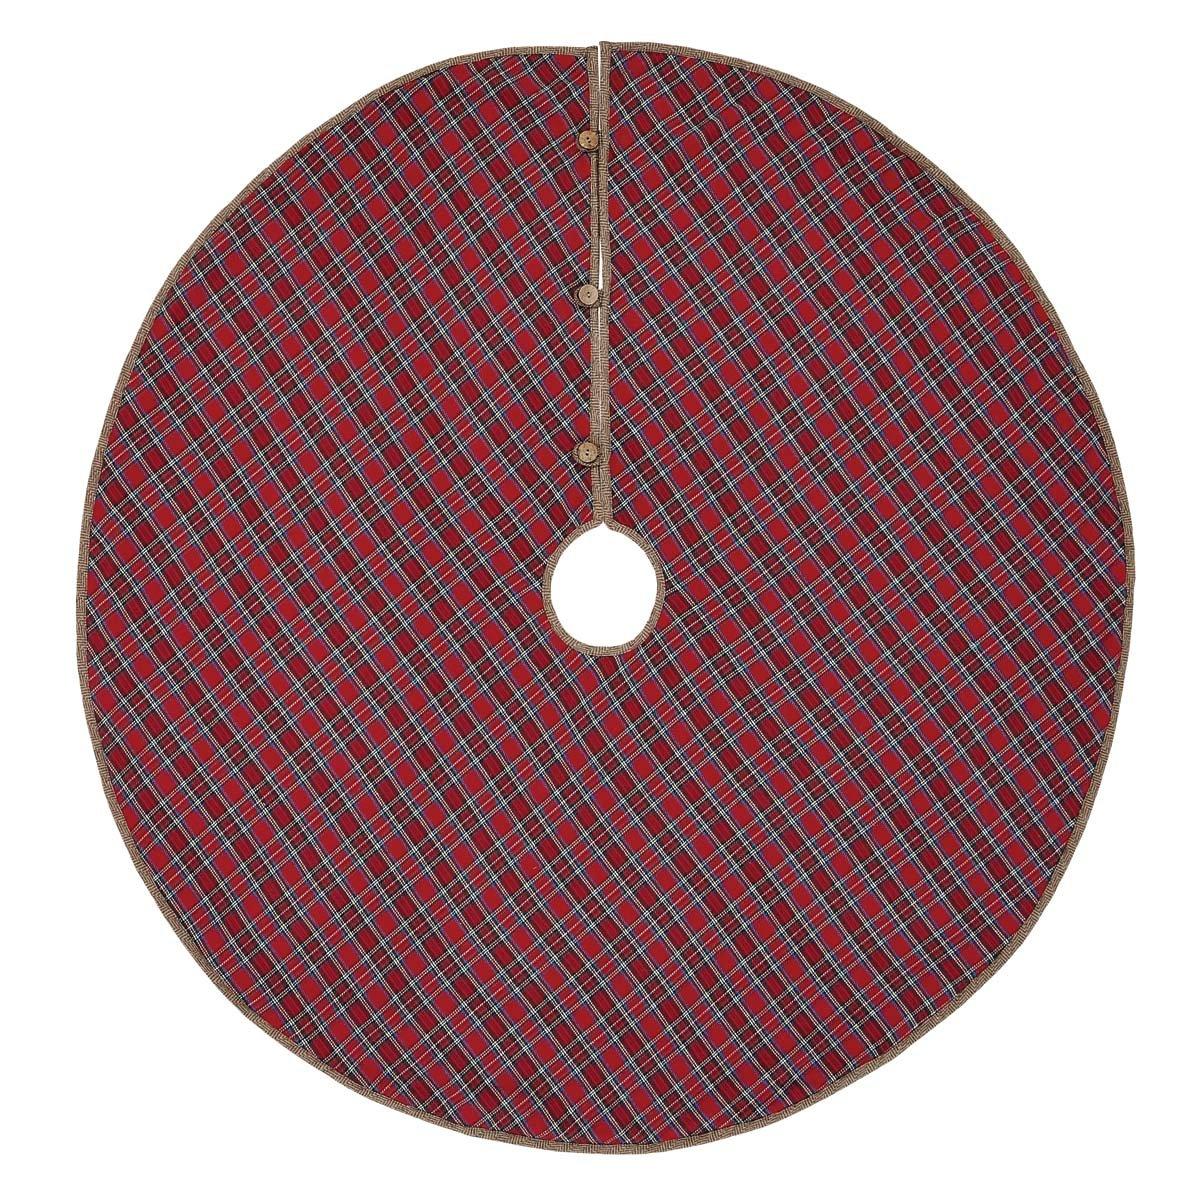 VHC Brands Christmas Holiday Decor-Gavin Tree Skirt, 55'' Diameter, Red